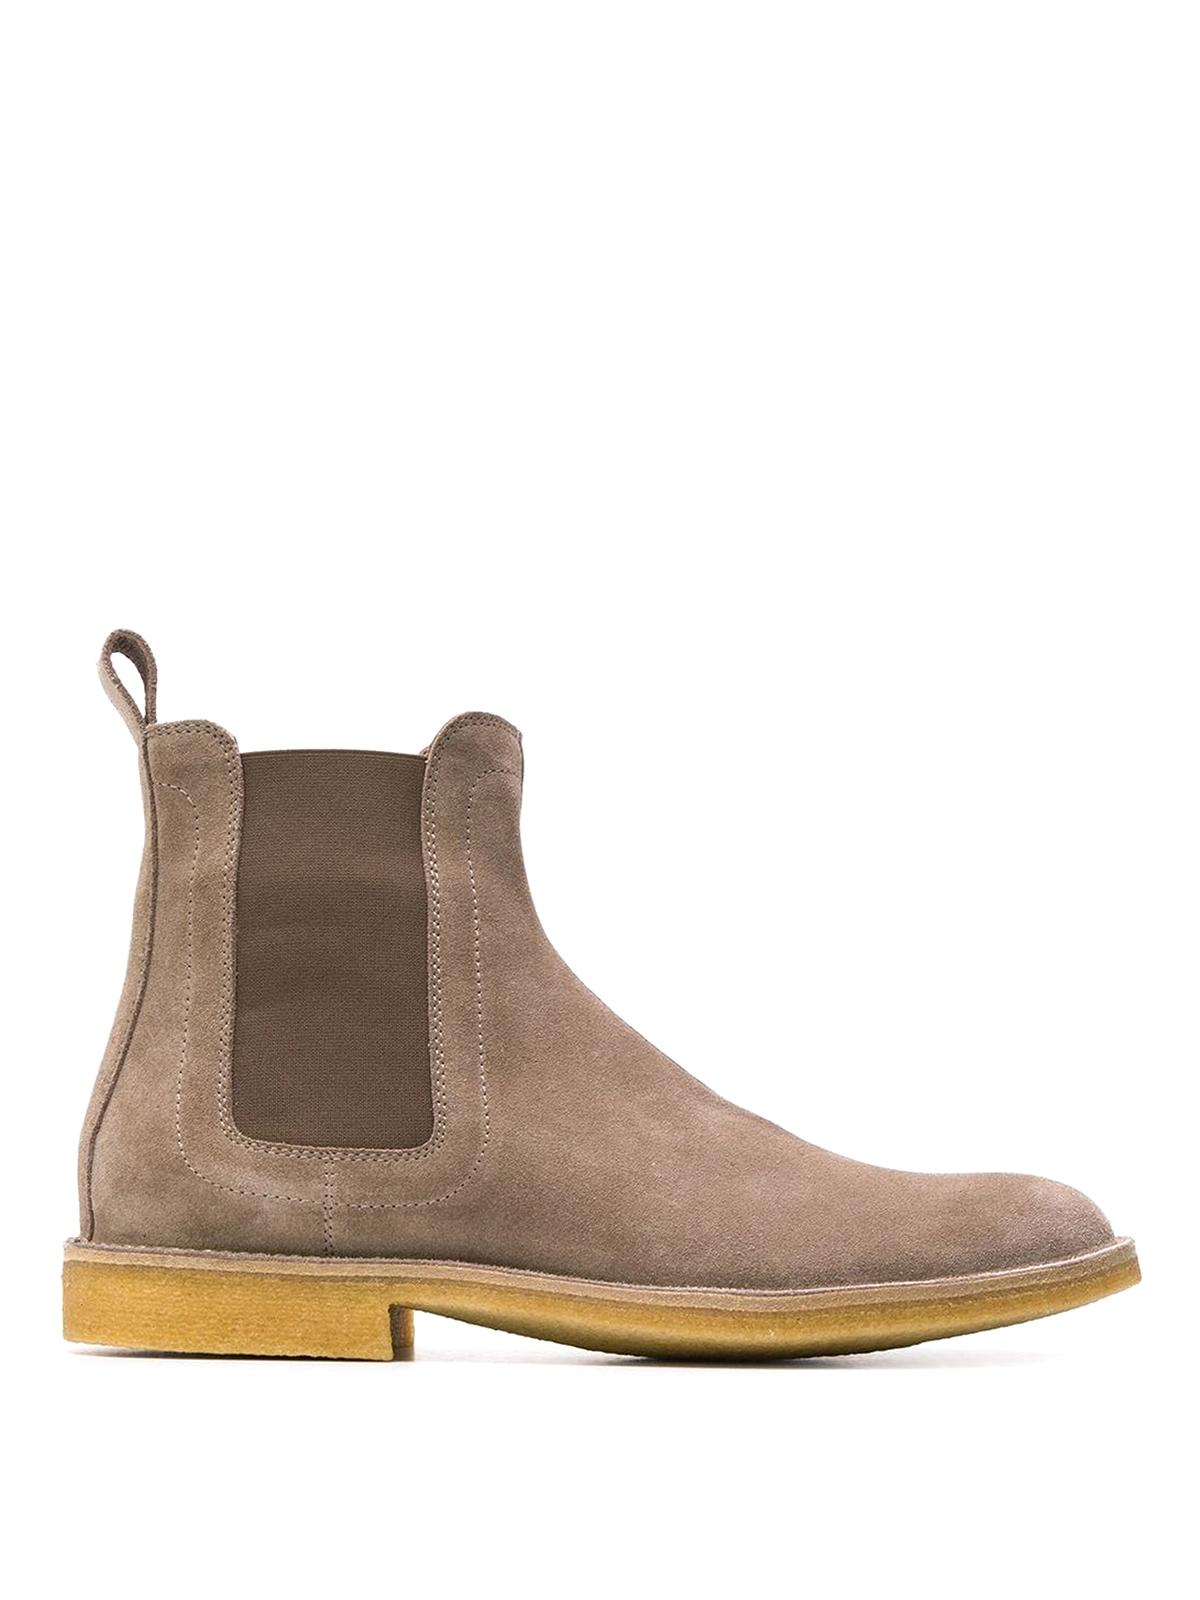 f870f184893ea Bottega Veneta - Suede Chelsea boots - ankle boots - 312345VQ7802304